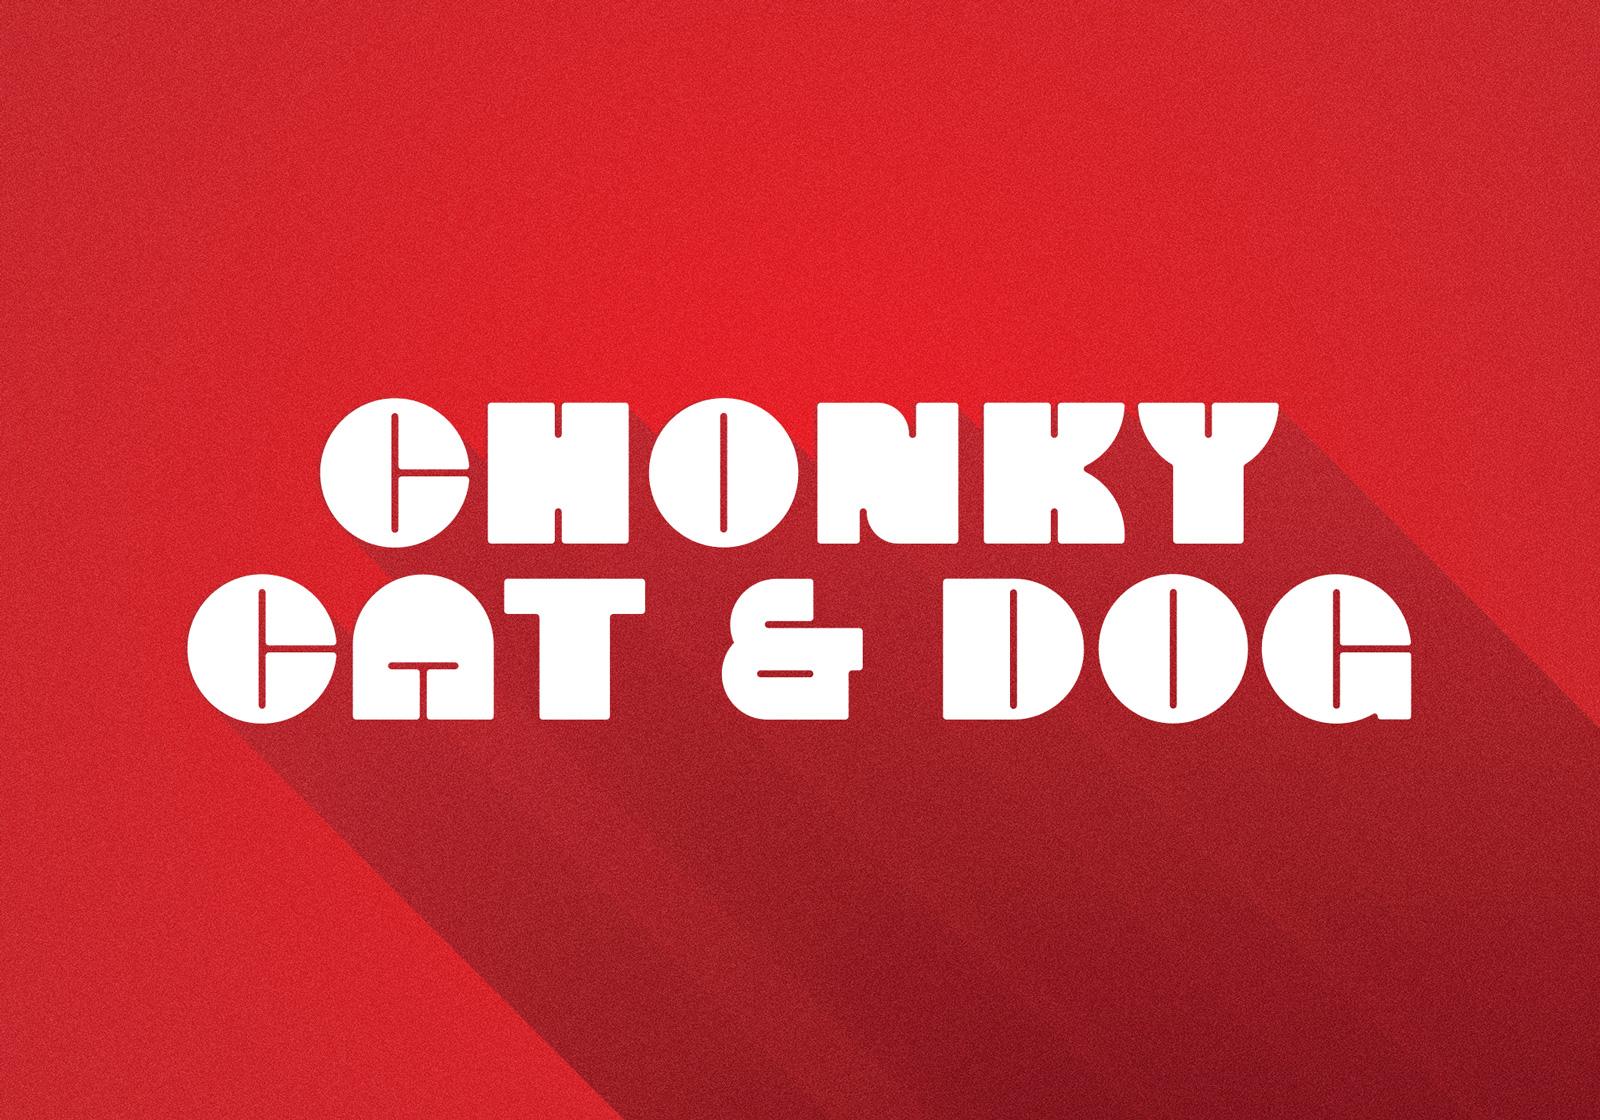 Chonky_font_4